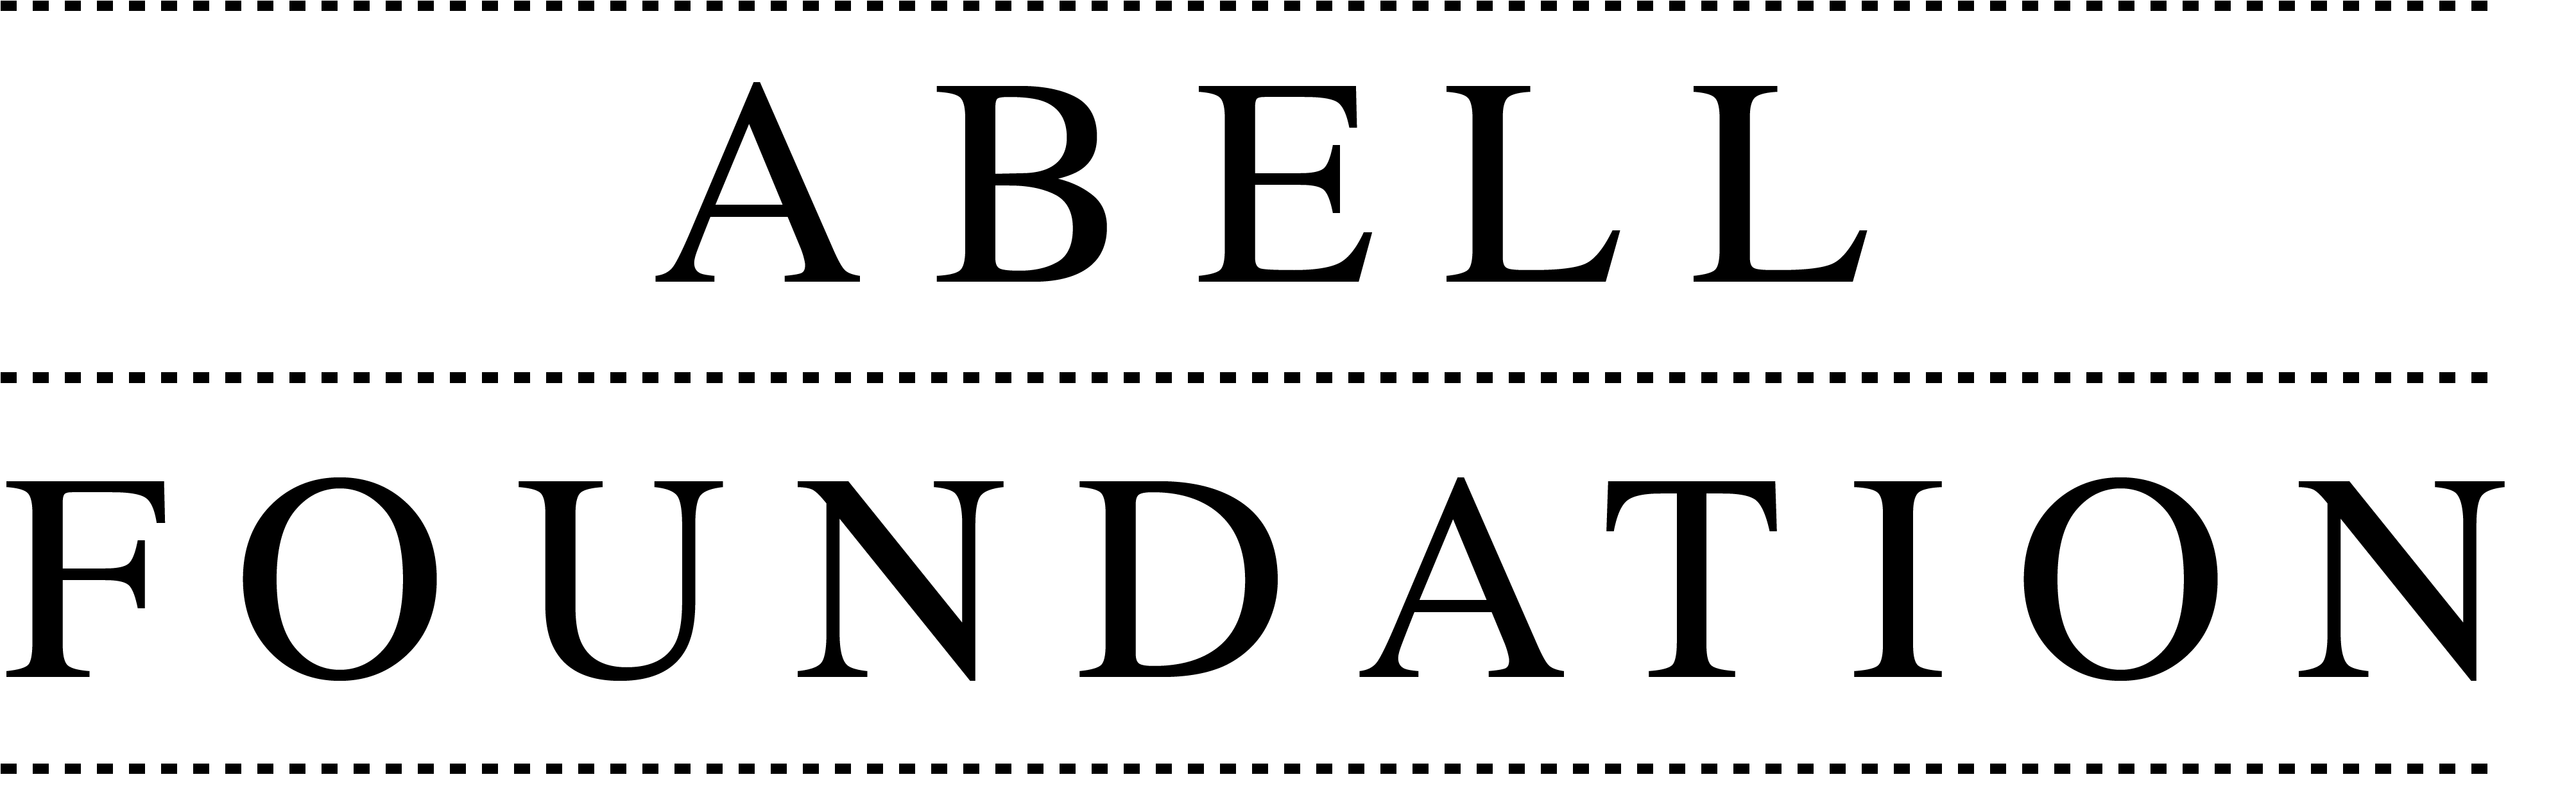 Abell Foundation Logo